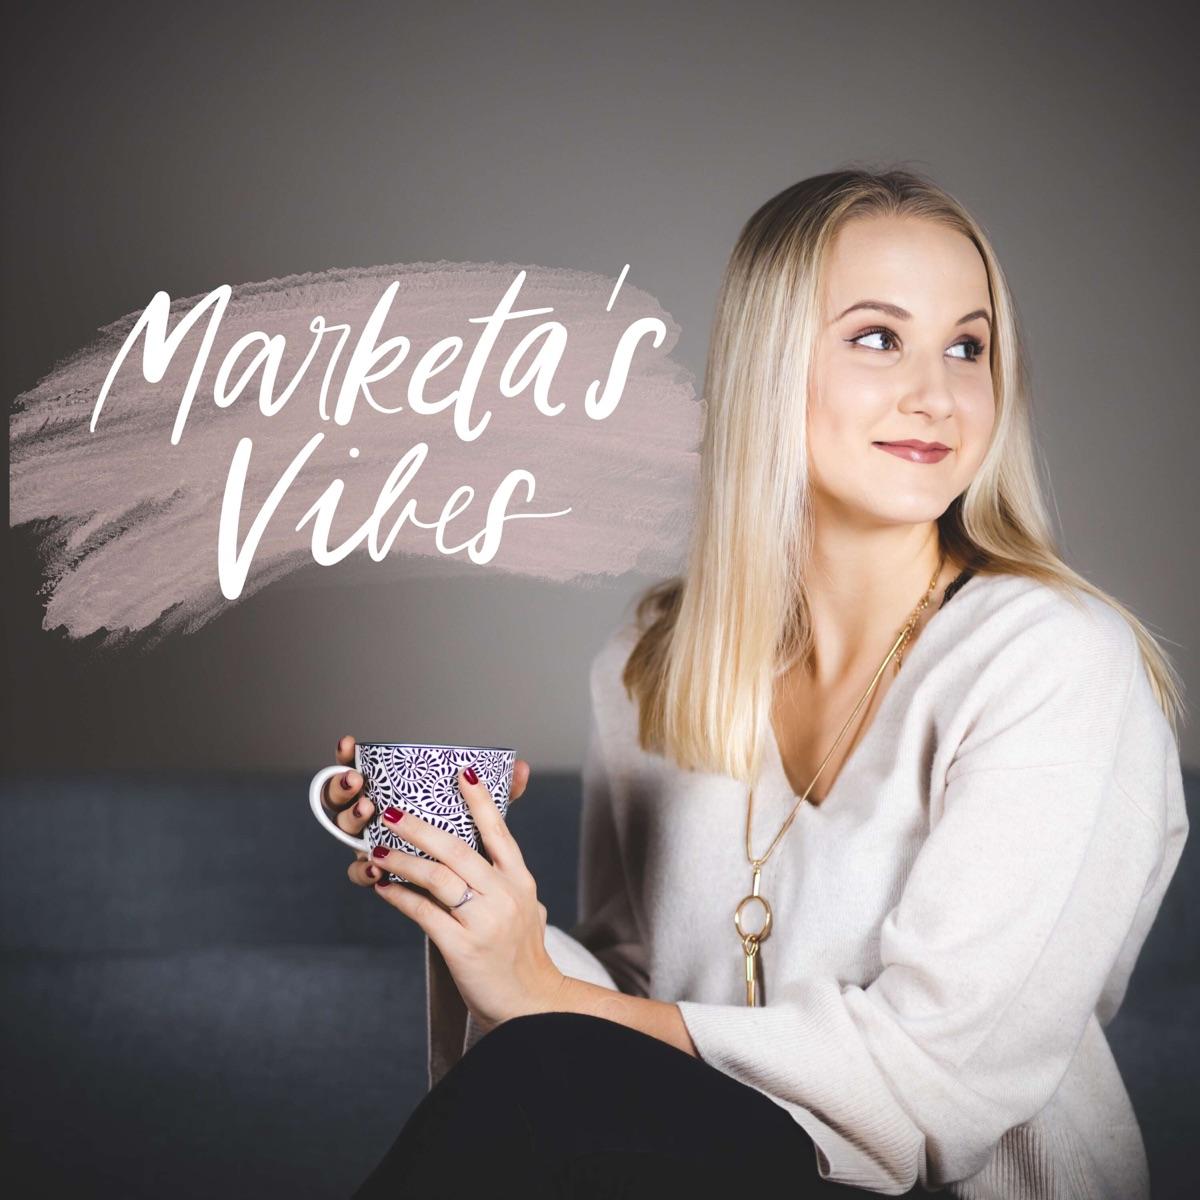 Marketa's Vibes